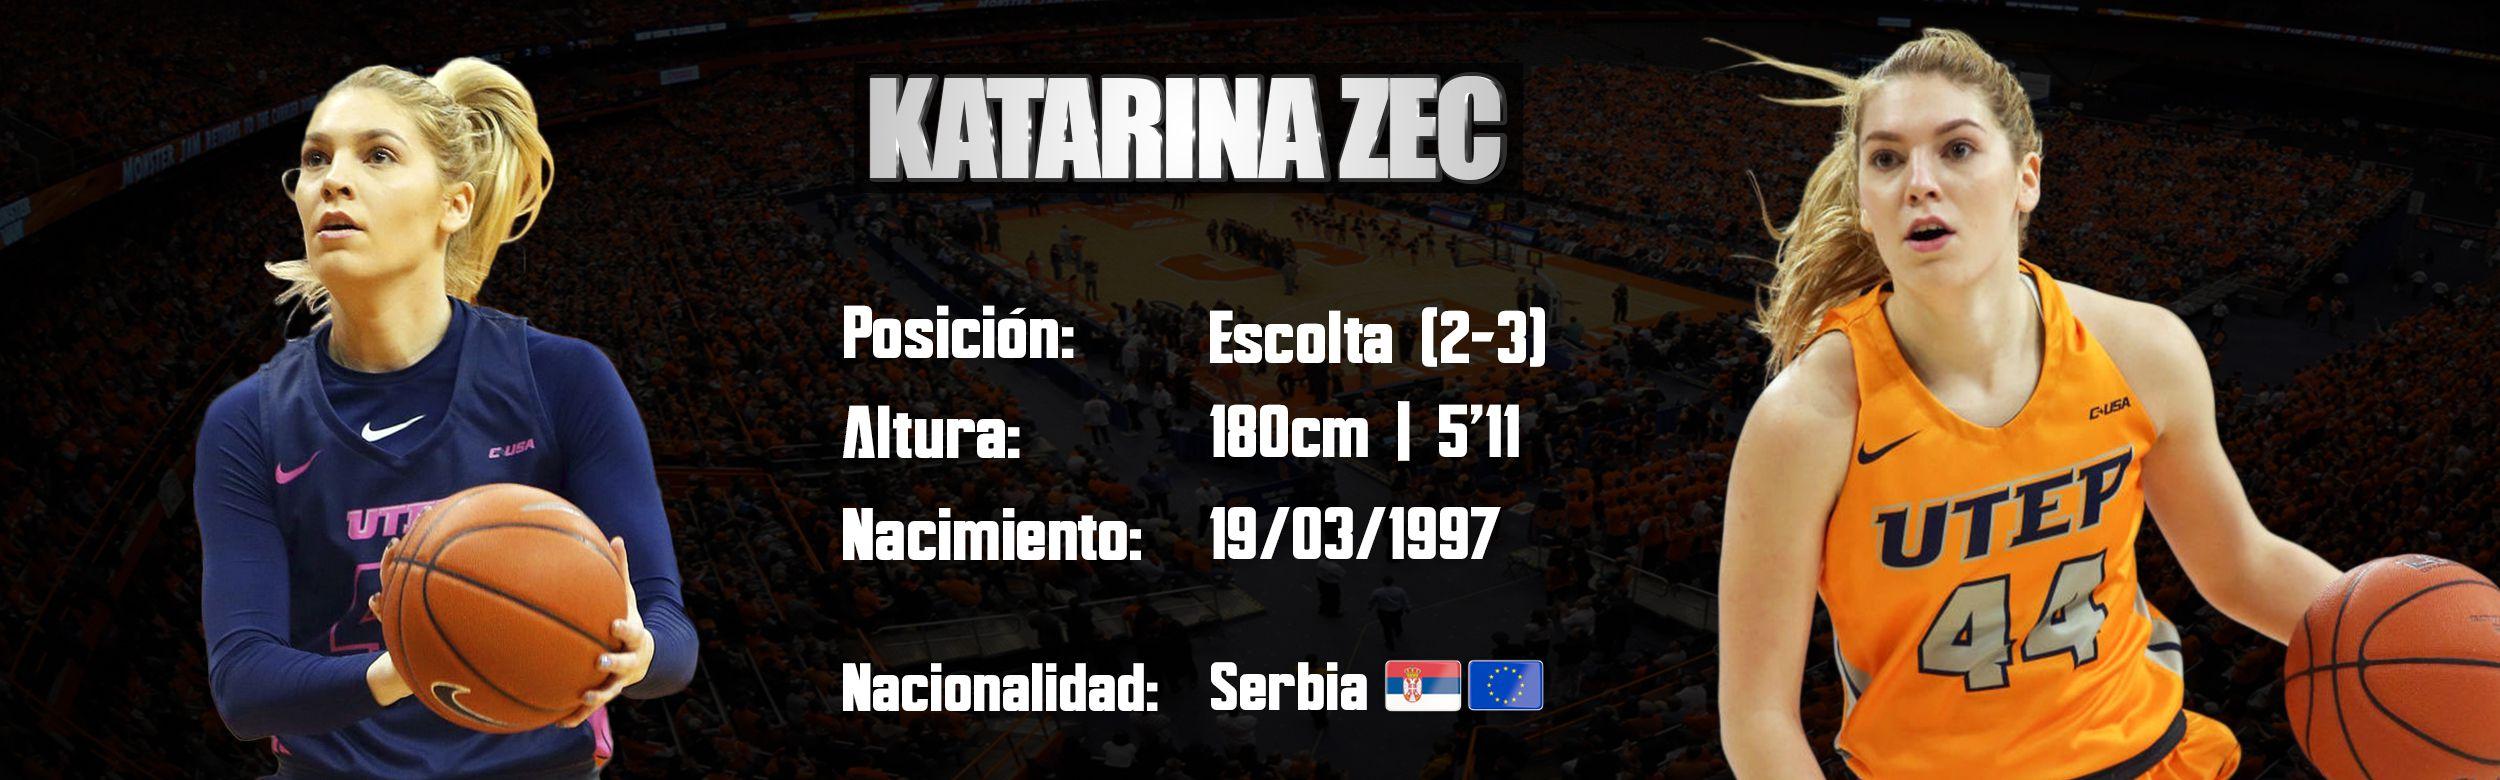 Katarina Zec